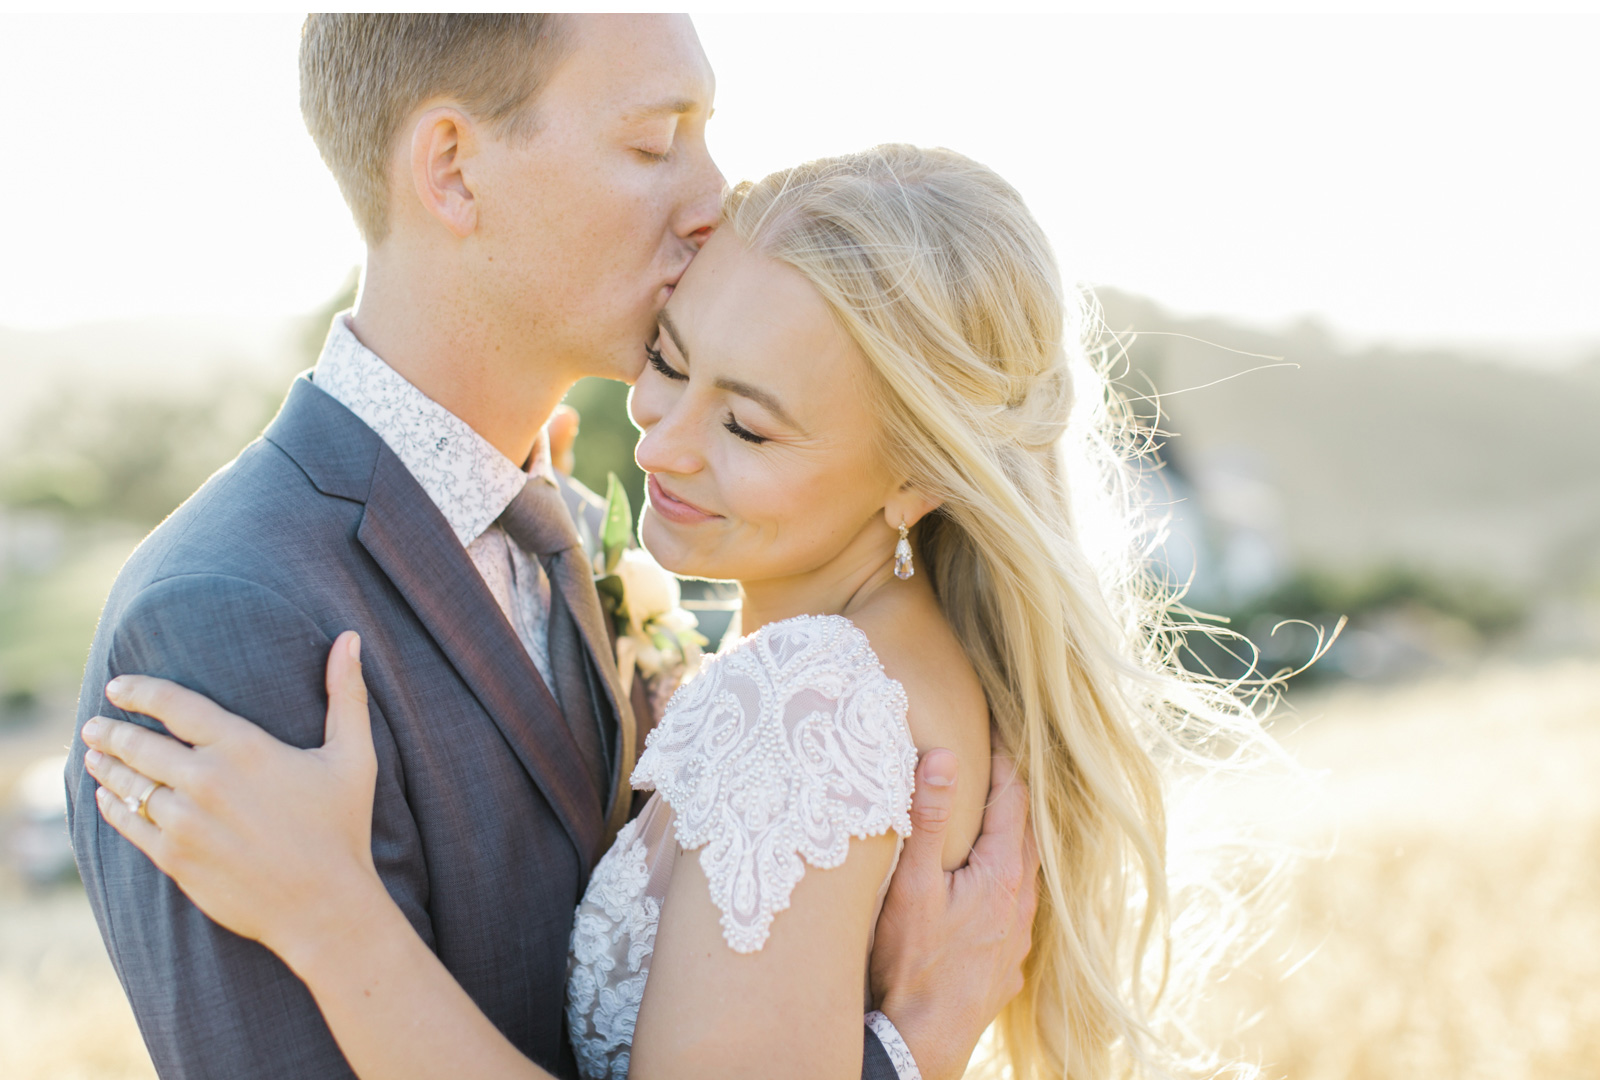 Natalie-Schutt-Photography's-Wedding-Style-Me-Pretty-Paso-Robles_04.jpg